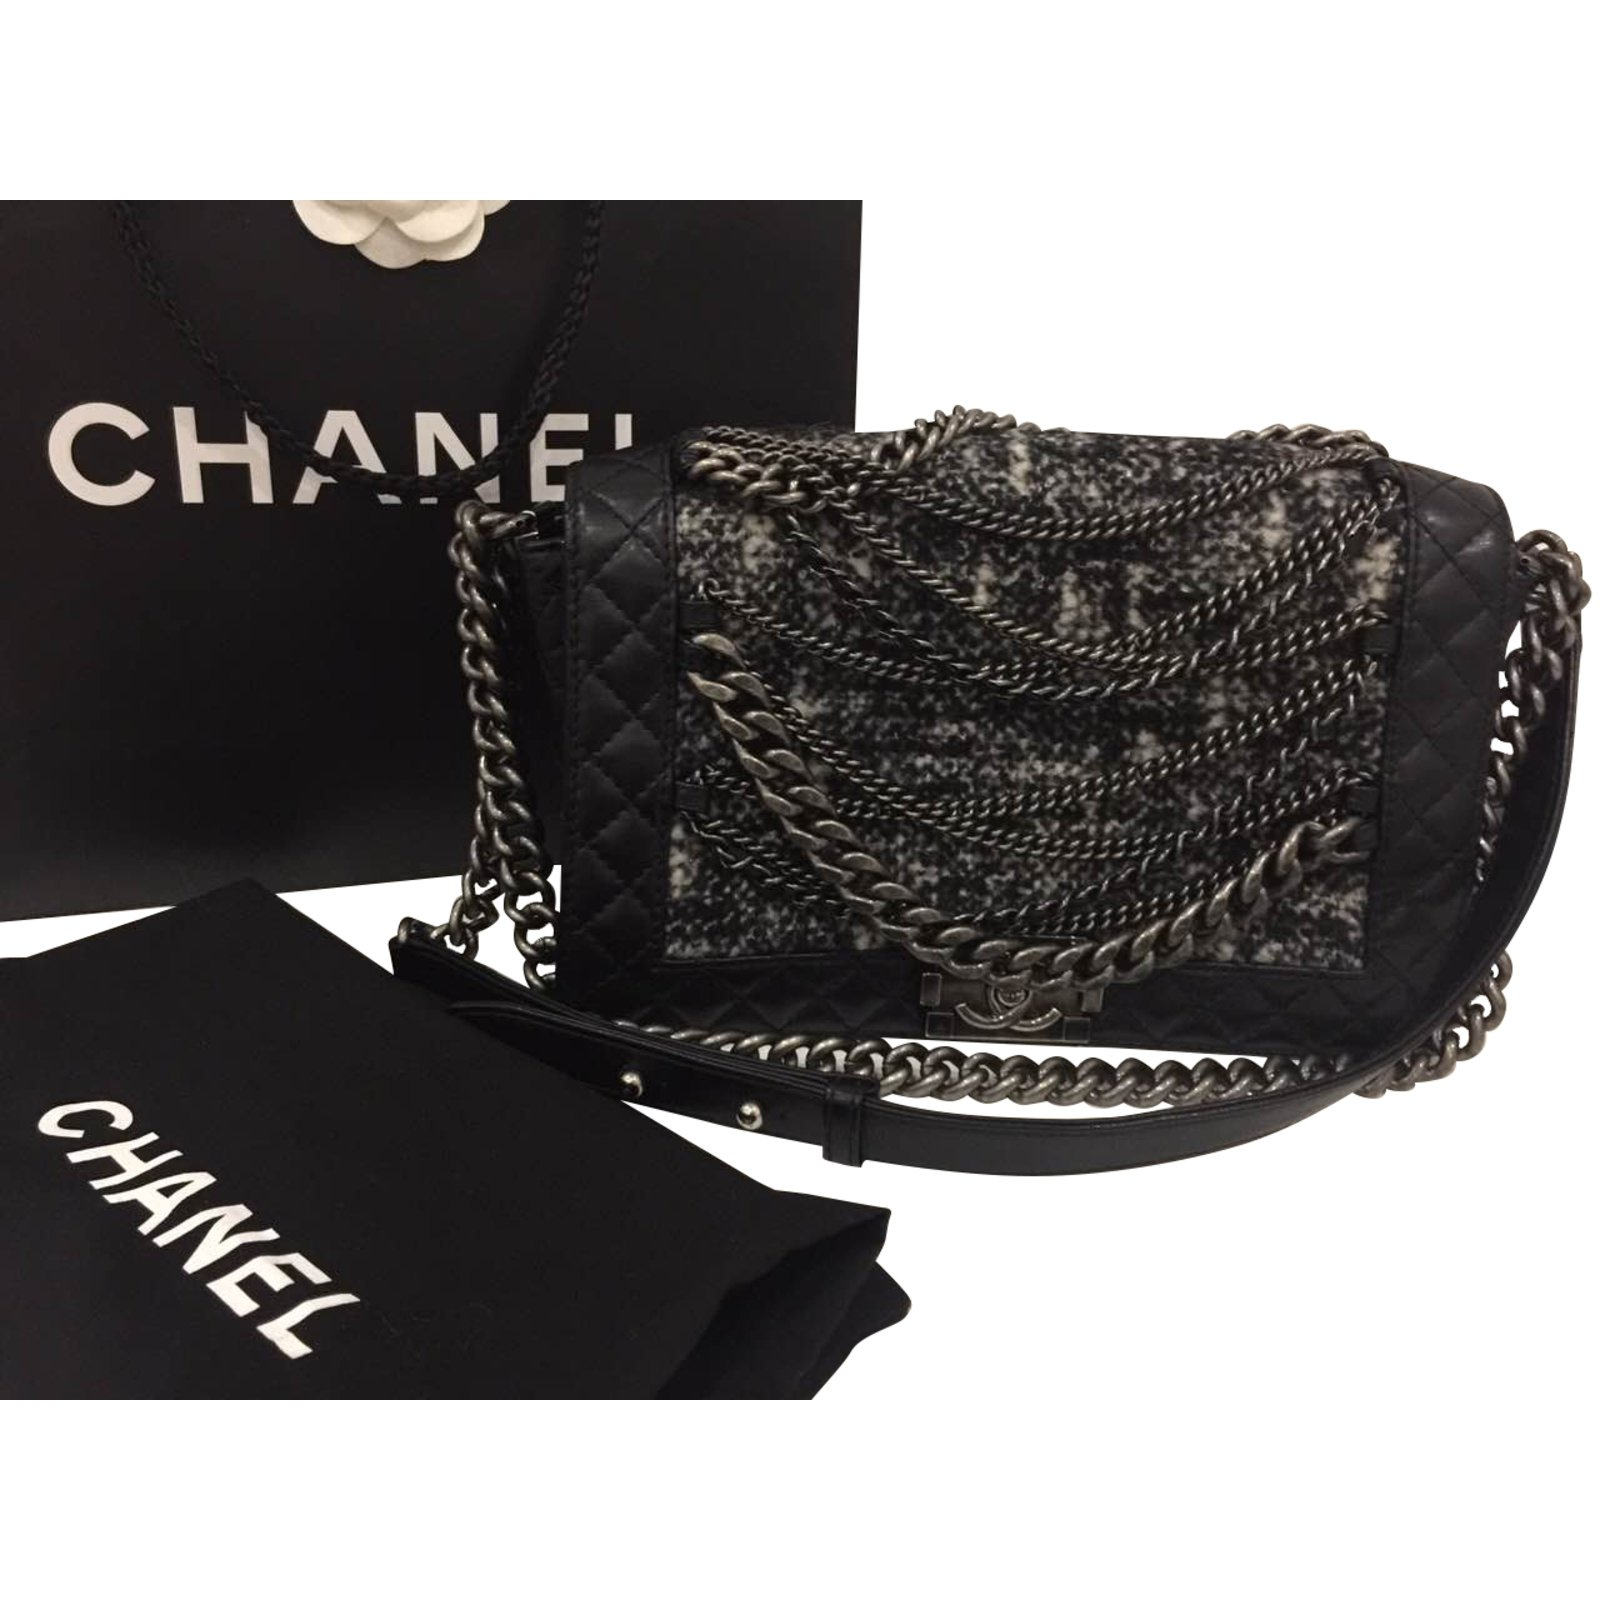 Chanel Boy Chain Bag Leather And Tweed Handbags Black Ref 39294